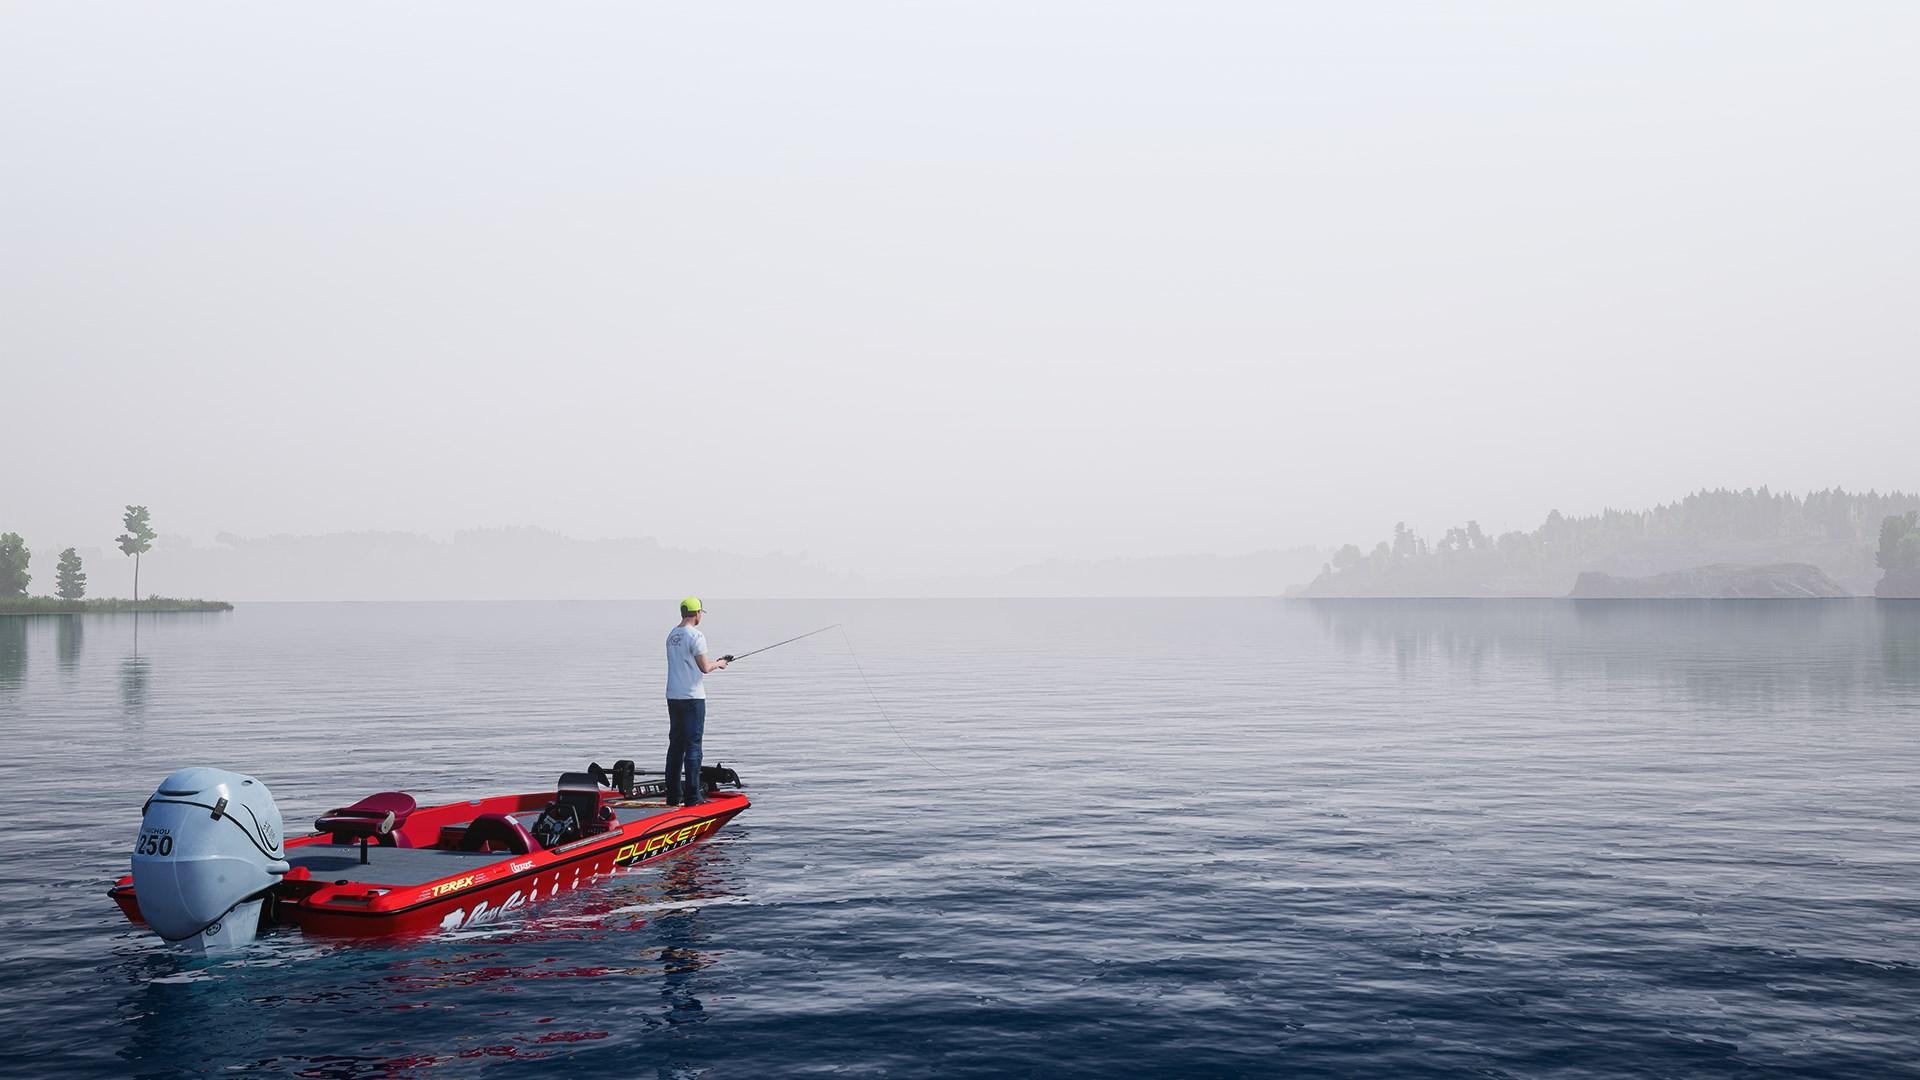 Fishing Sim World: Trophy Hunter's Equipment Pack